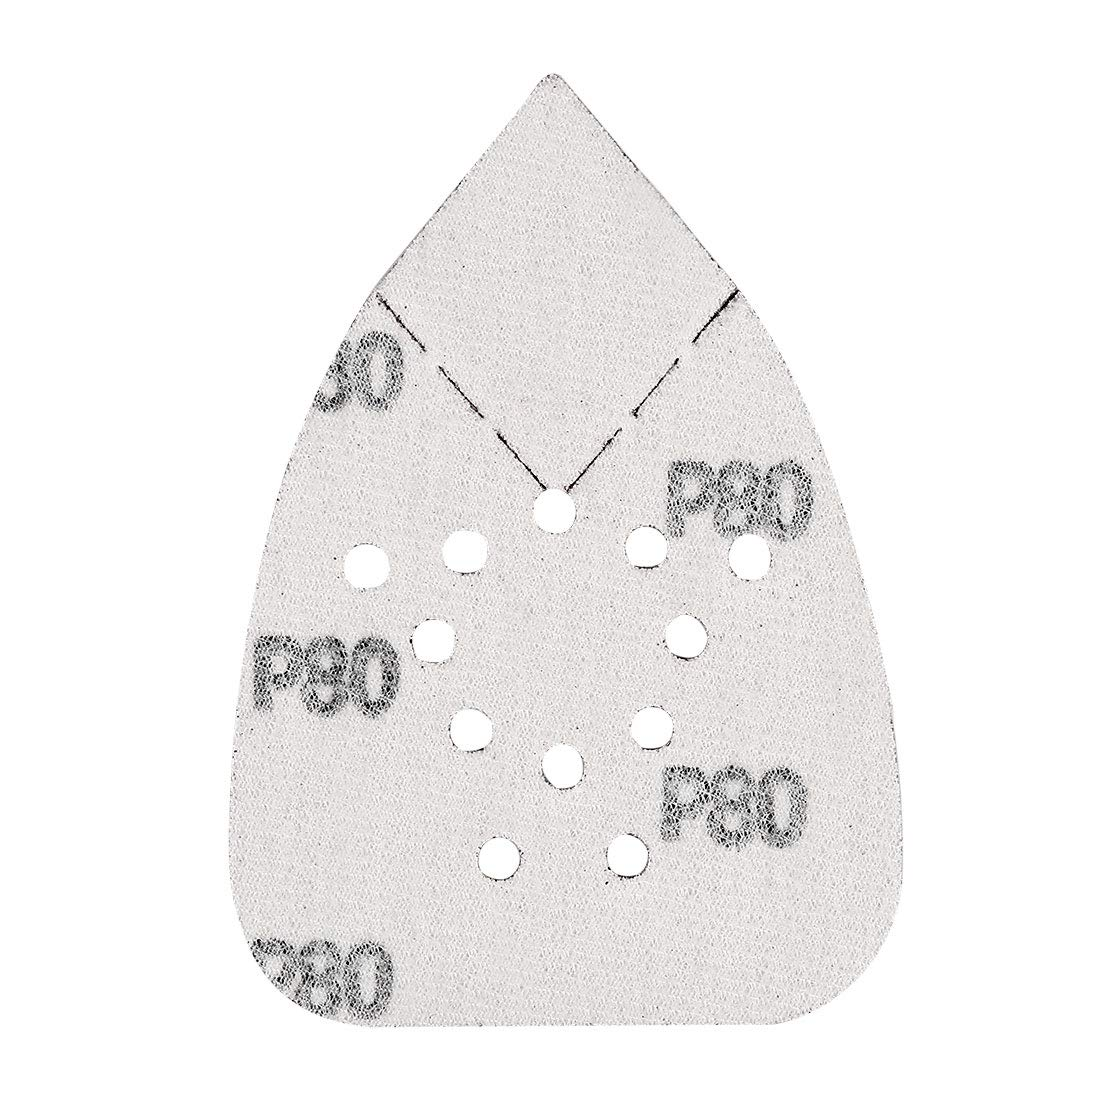 uxcell/® 24pcs 140x95mm Sanding Discs Sander Pads Assorted 40 80 120 240 Grits 12 Hole Sandpaper for Random Orbital Sander